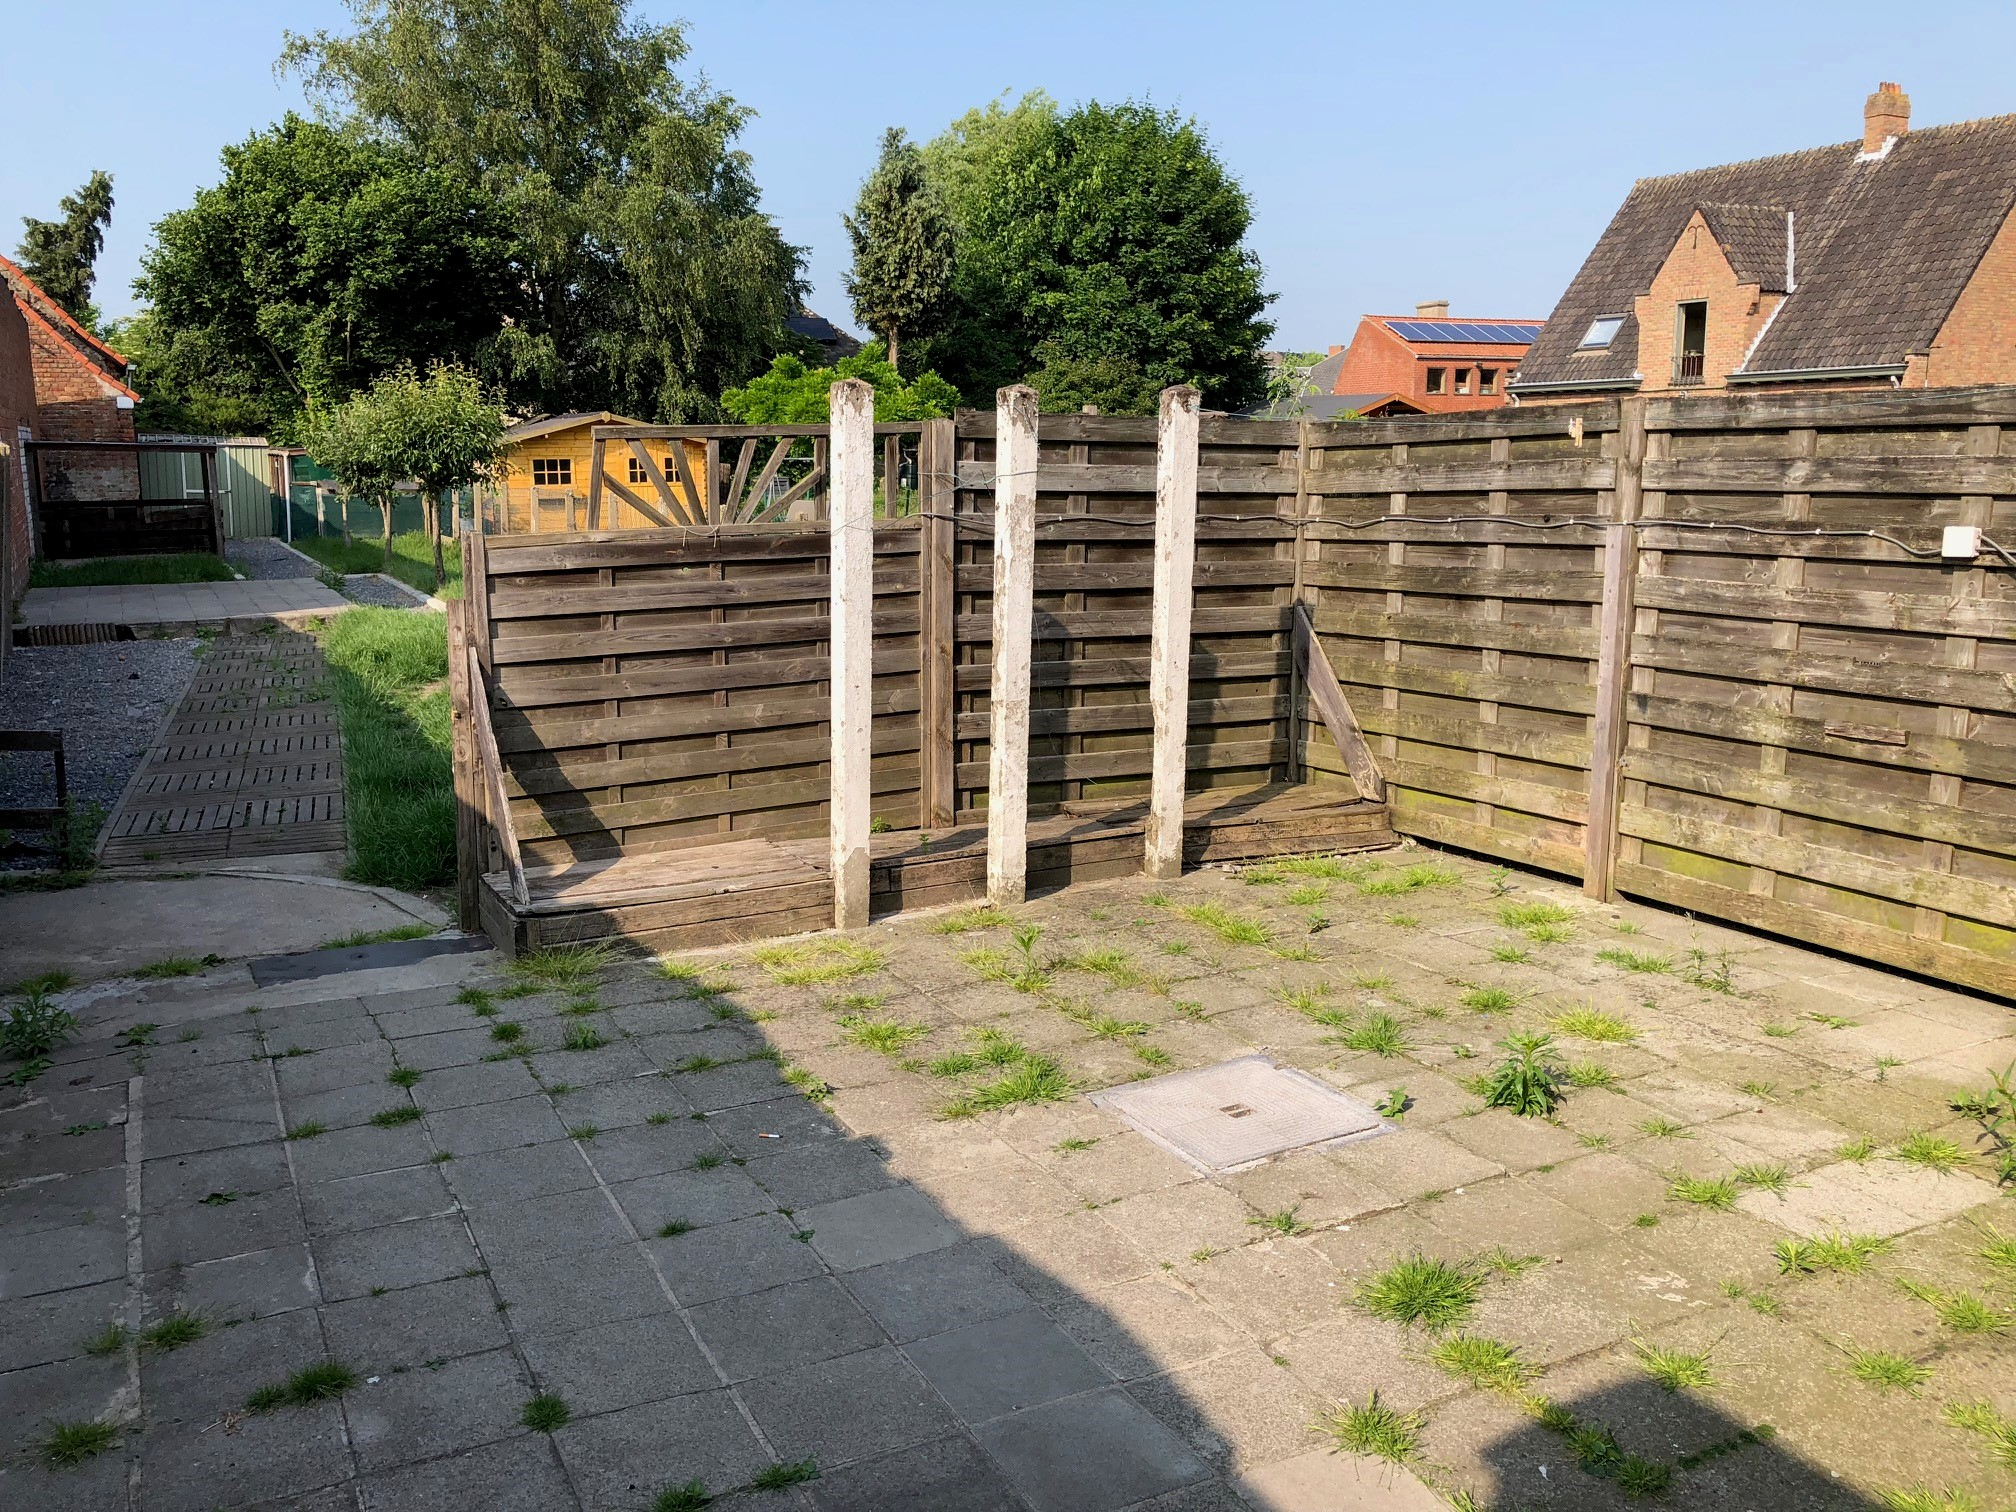 Ruime te renoveren gezinswoning met diepe tuin hebo for Tuin renoveren